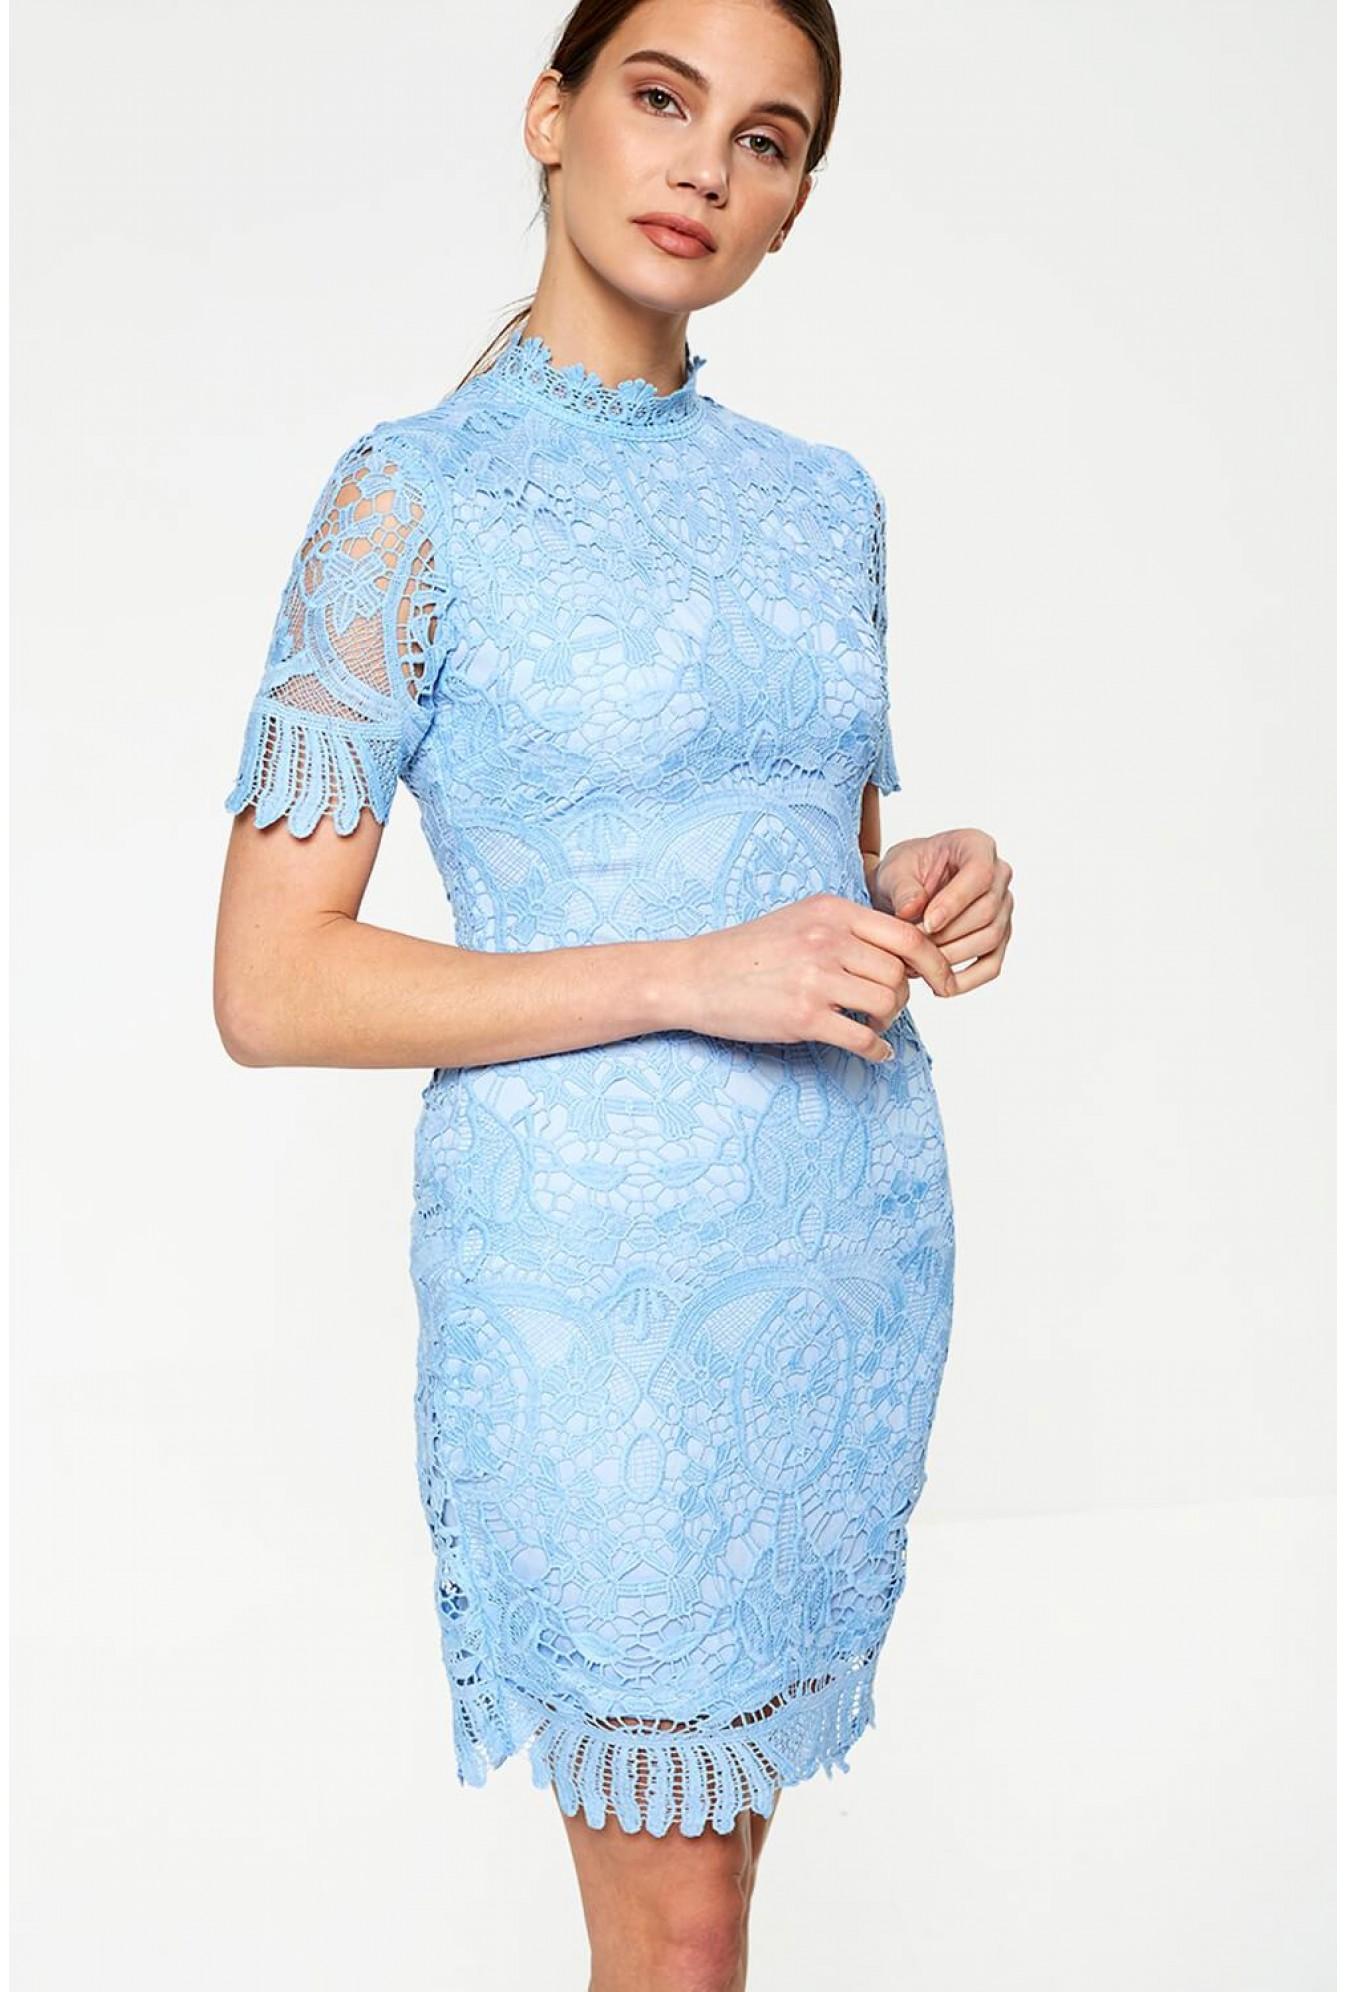 237dd43ccf51 Pixie Daisy Diana Crochet Overlay Midi Dress in Baby Blue